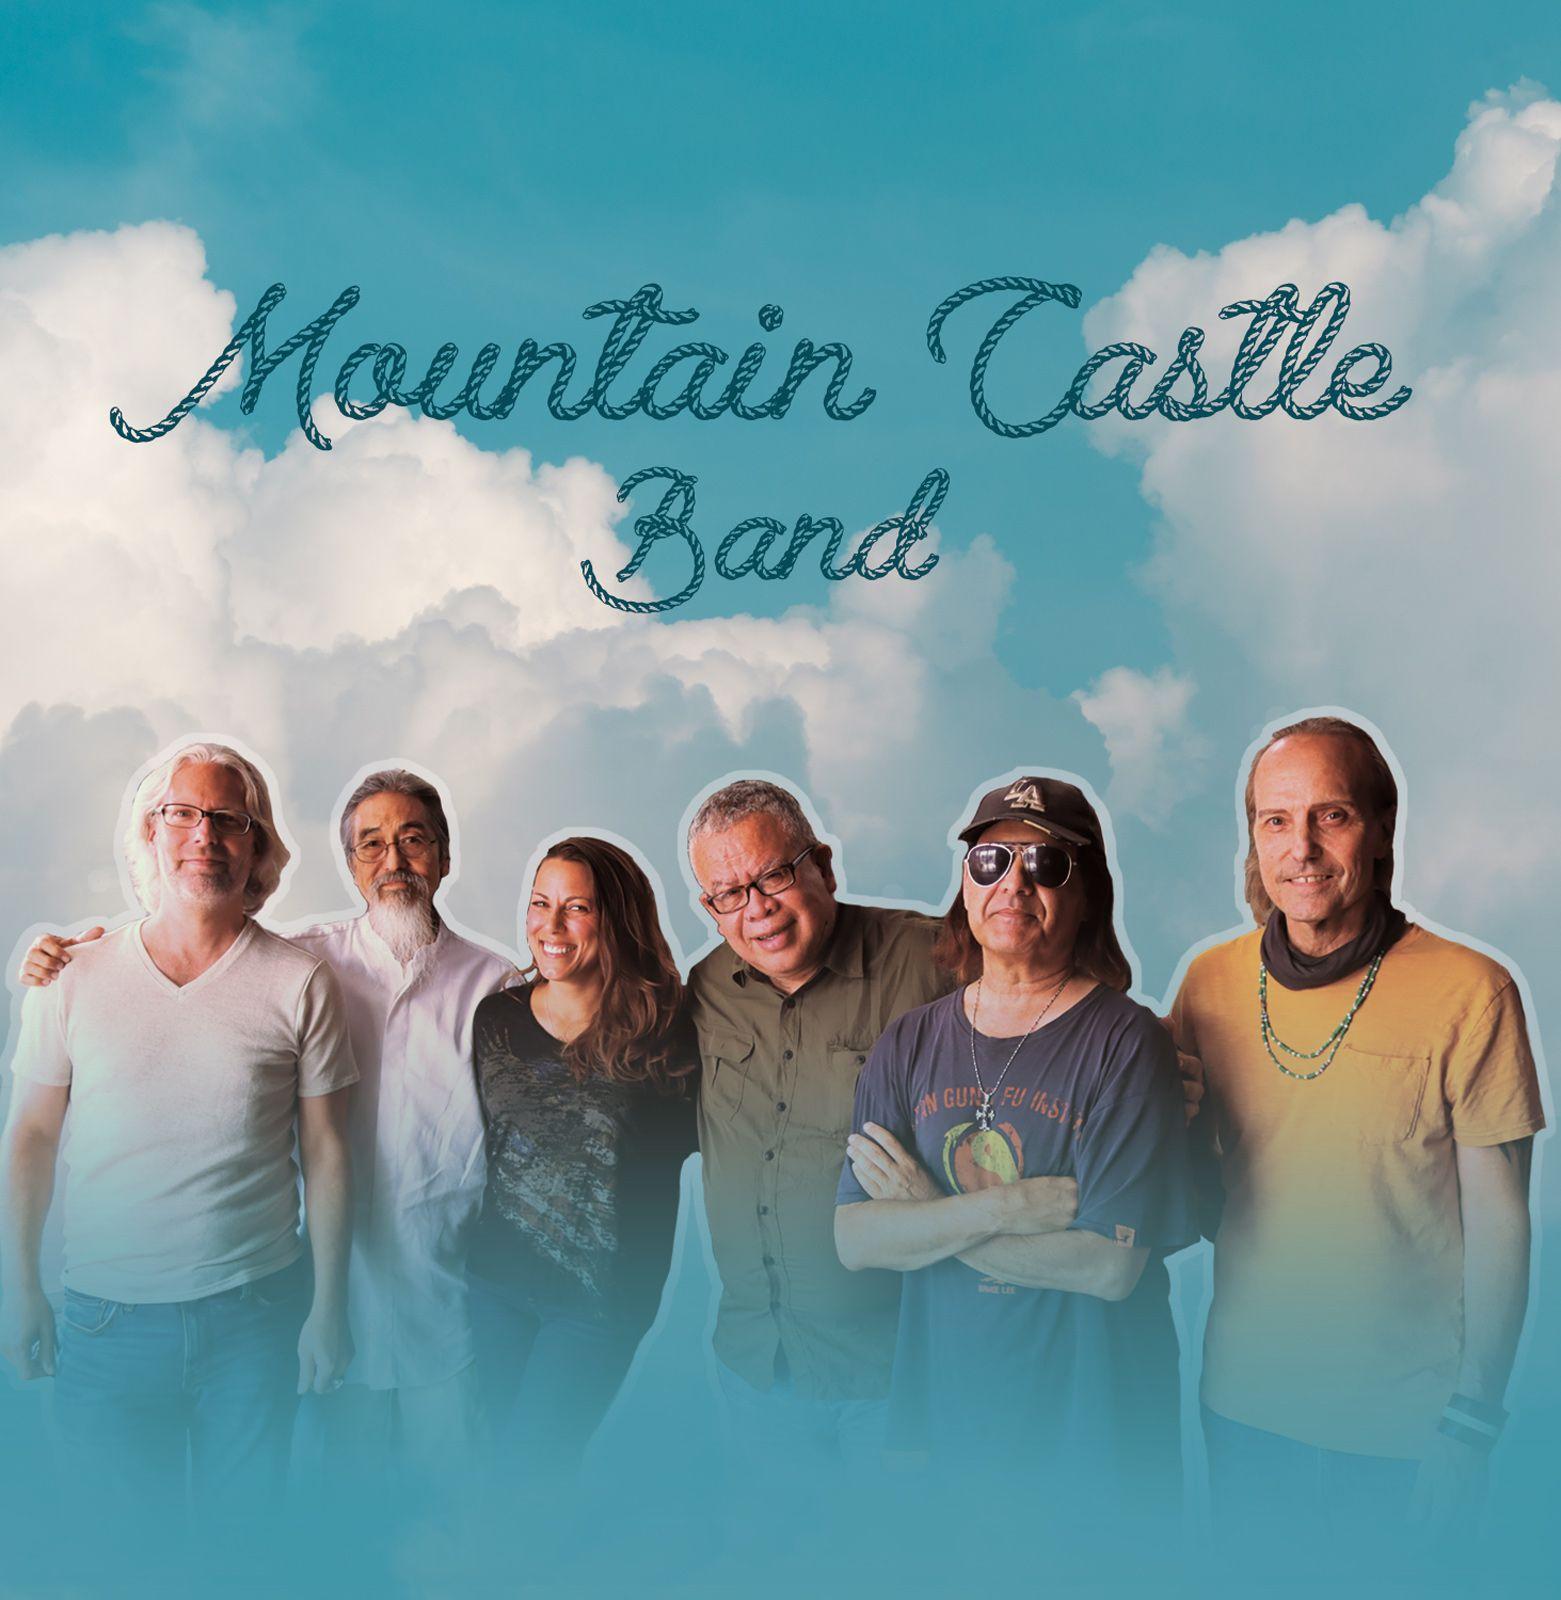 Mountain Castle Band